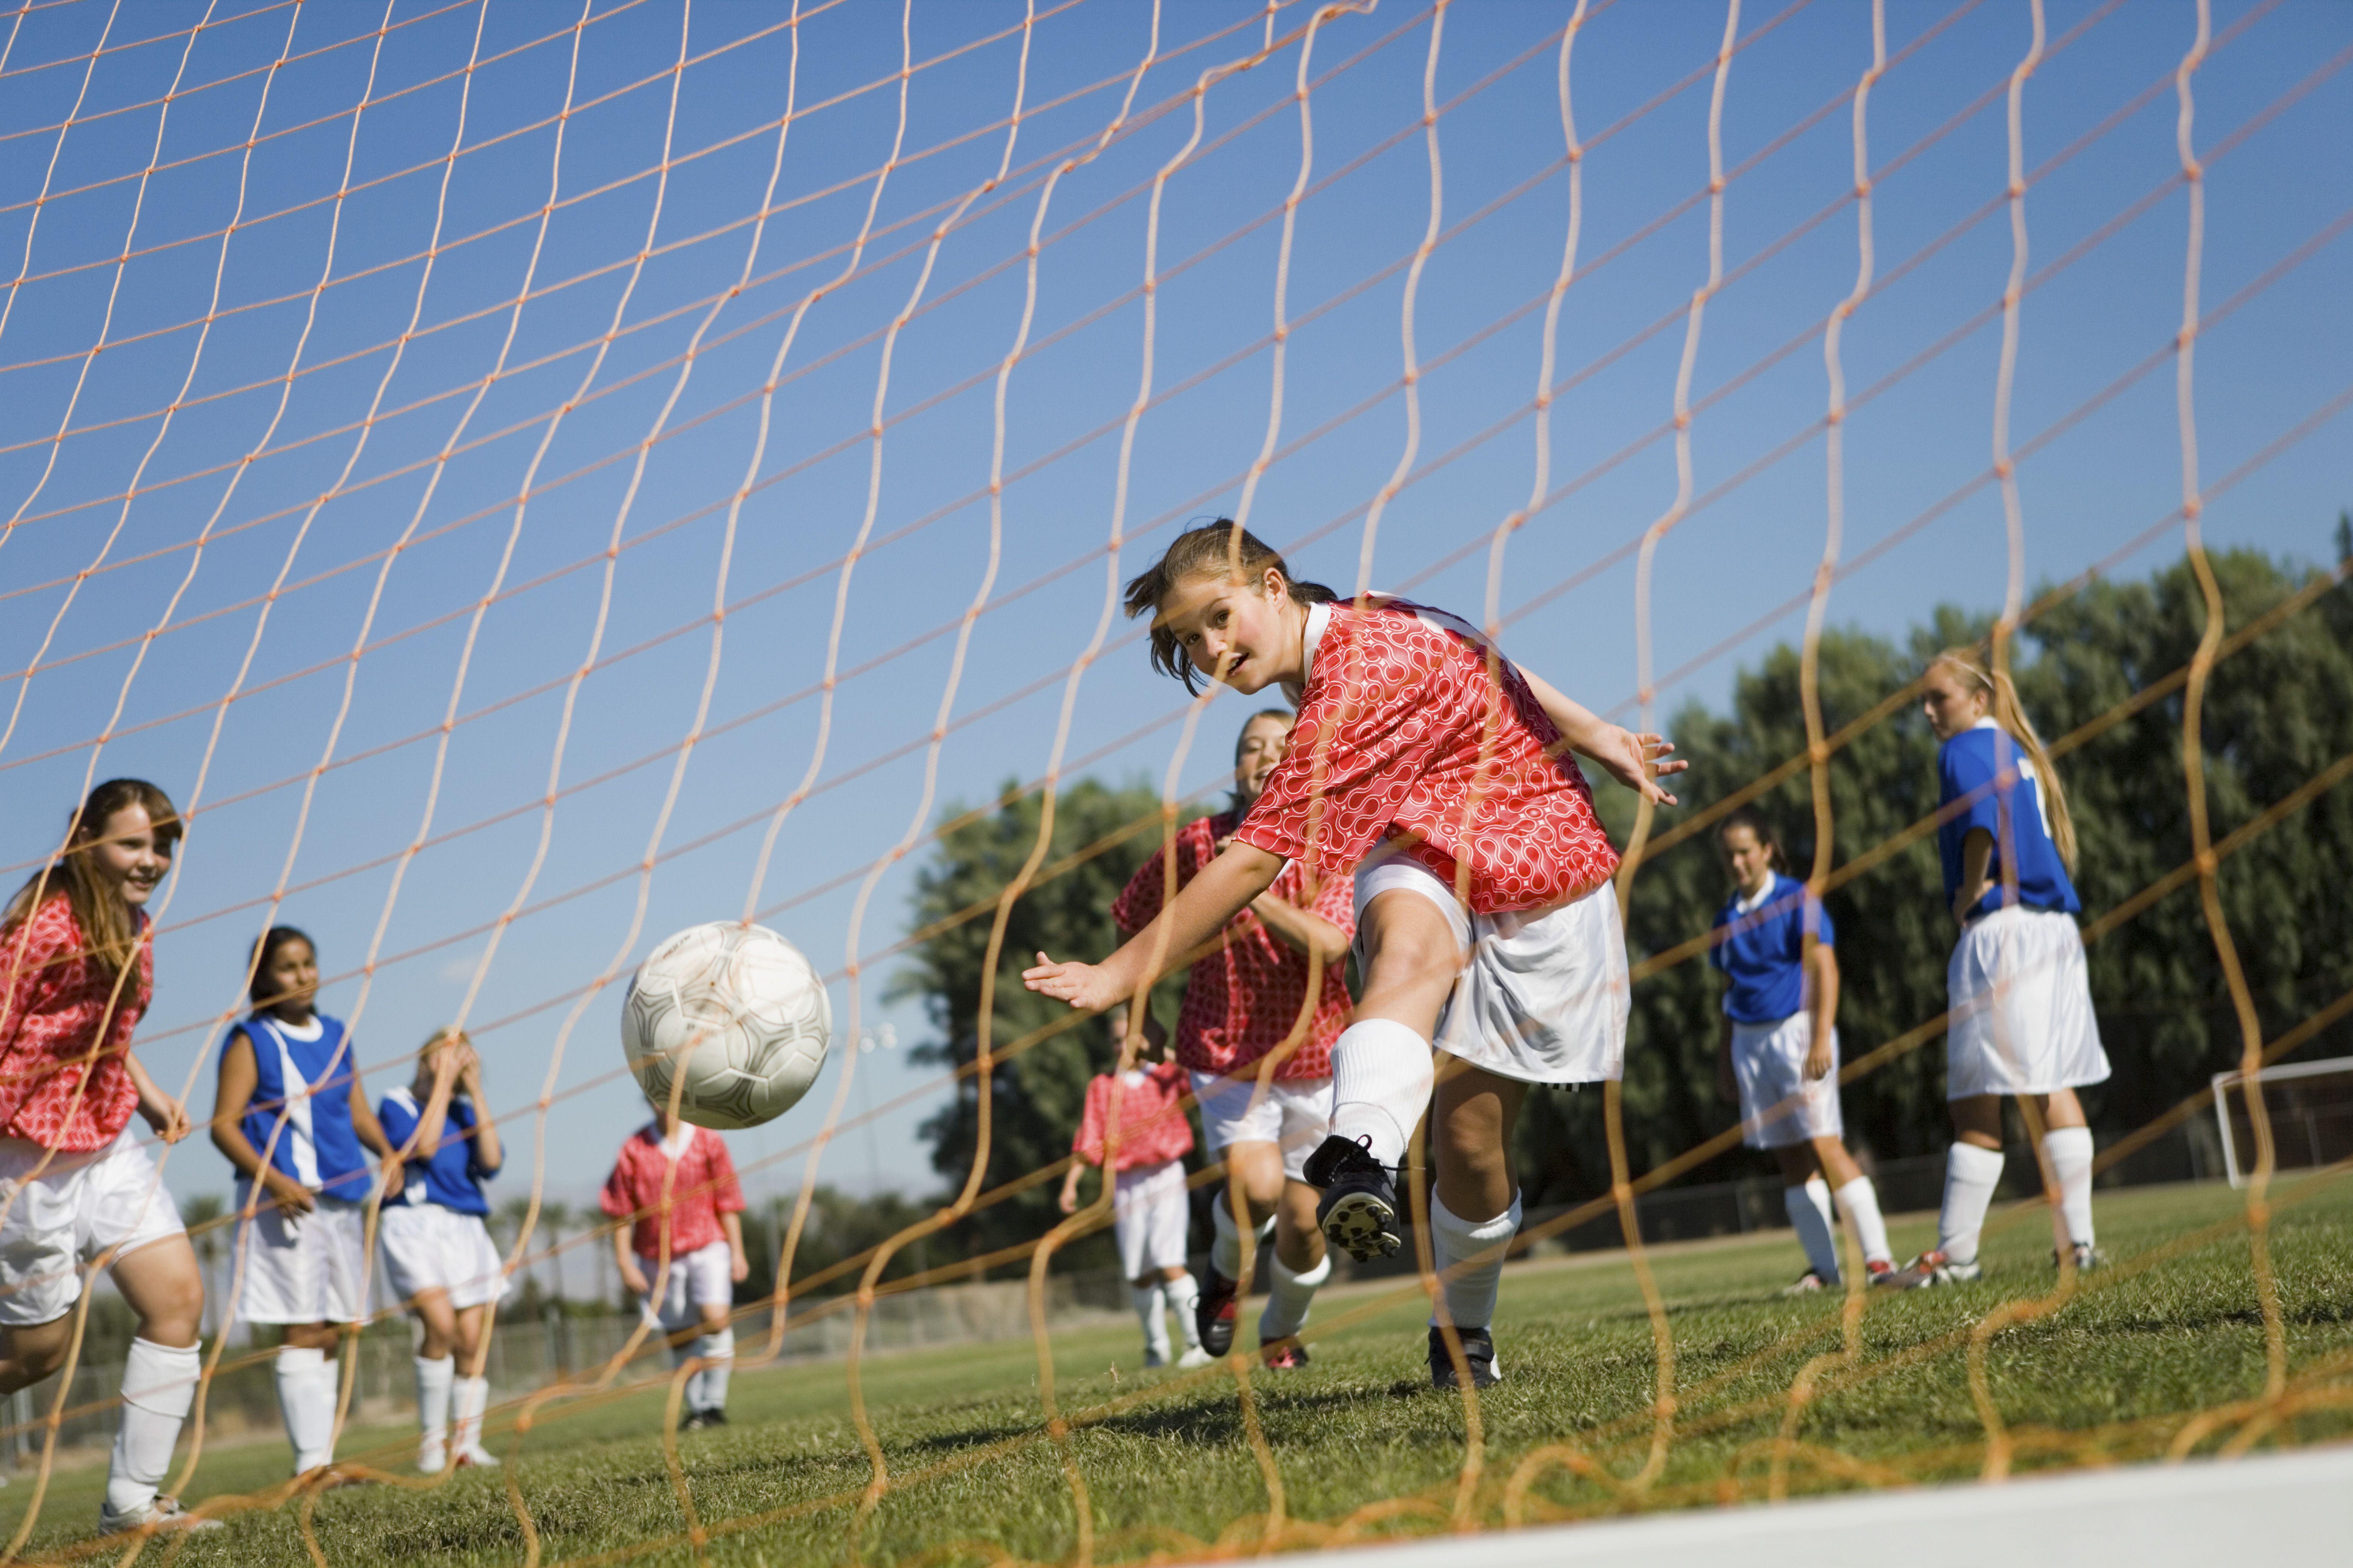 Teenage girl kicking a soccer goal